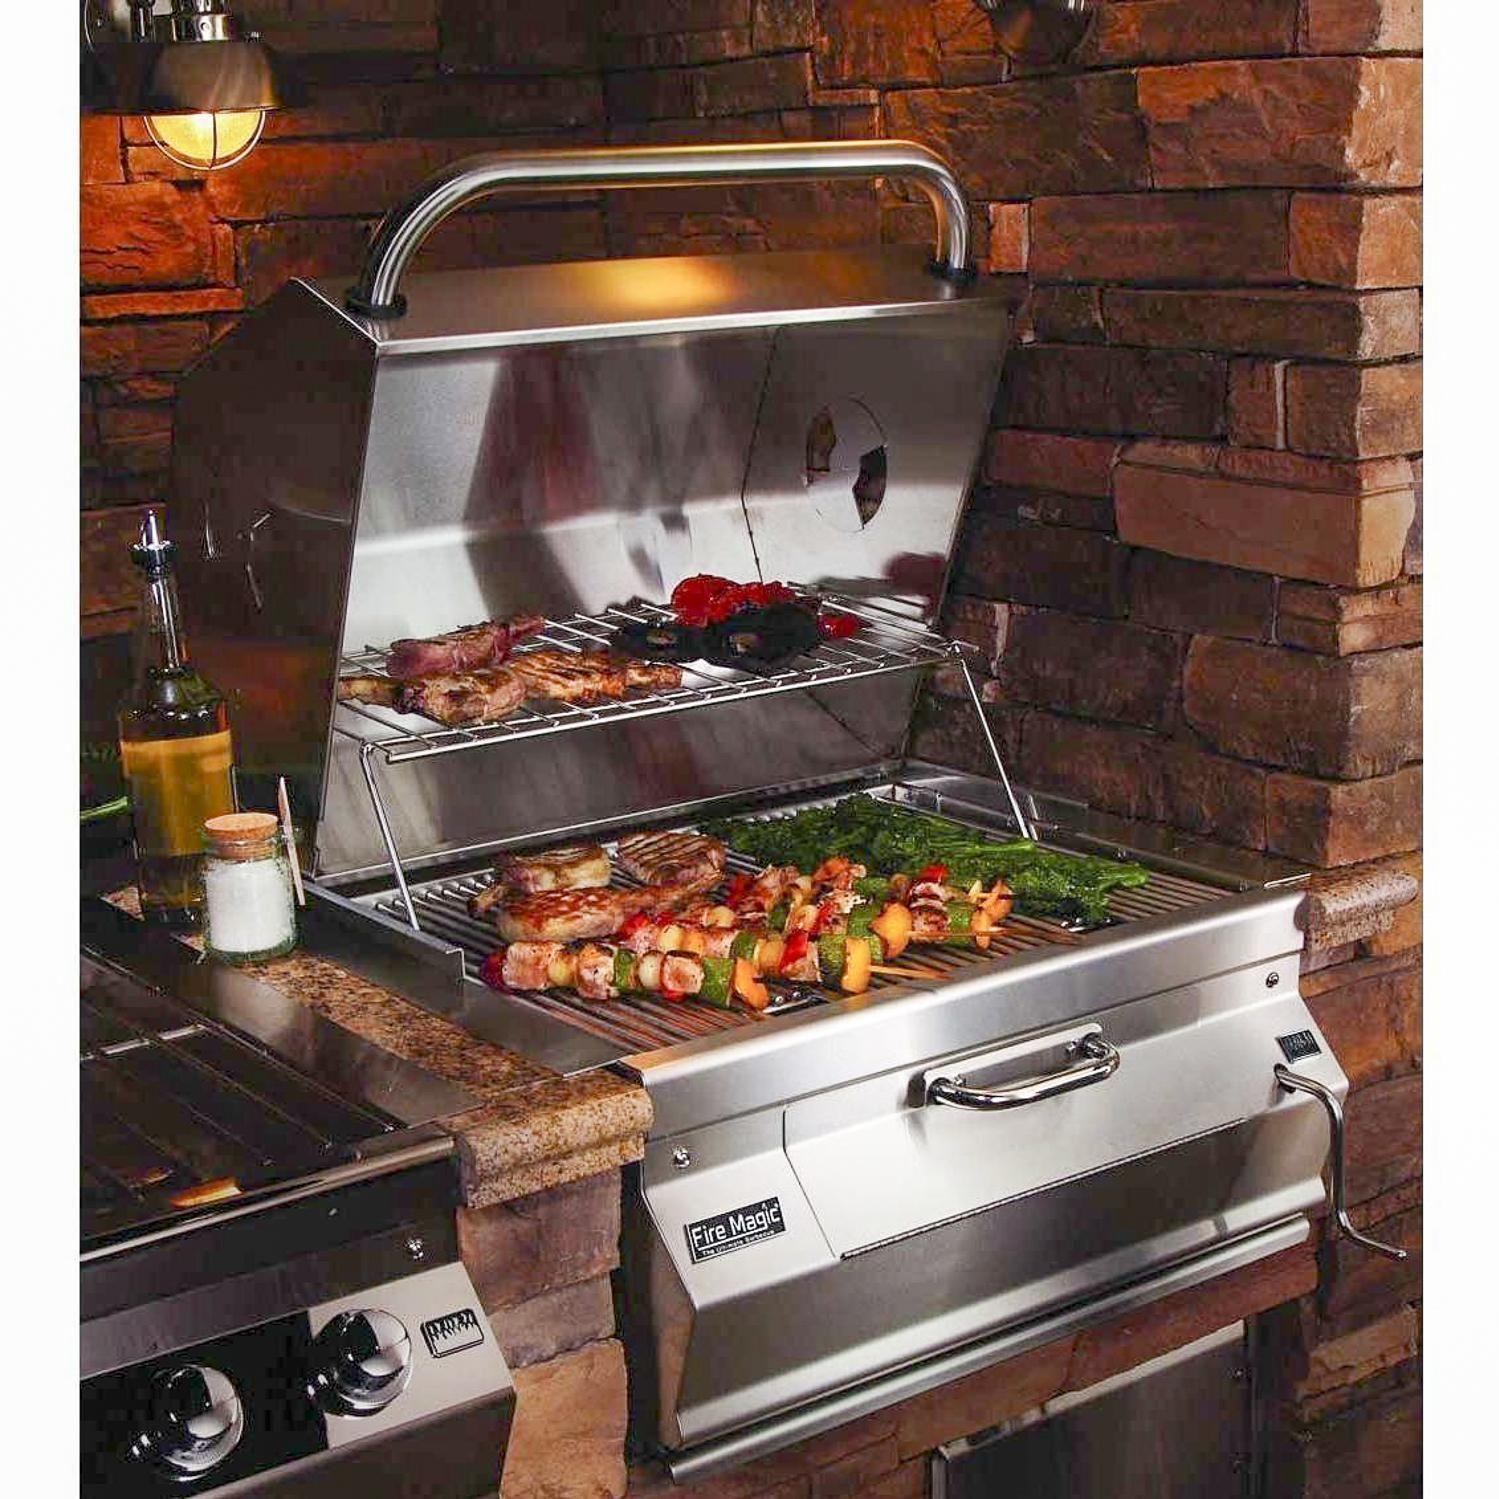 Fire magic legacy 24inch builtin smoker charcoal grill